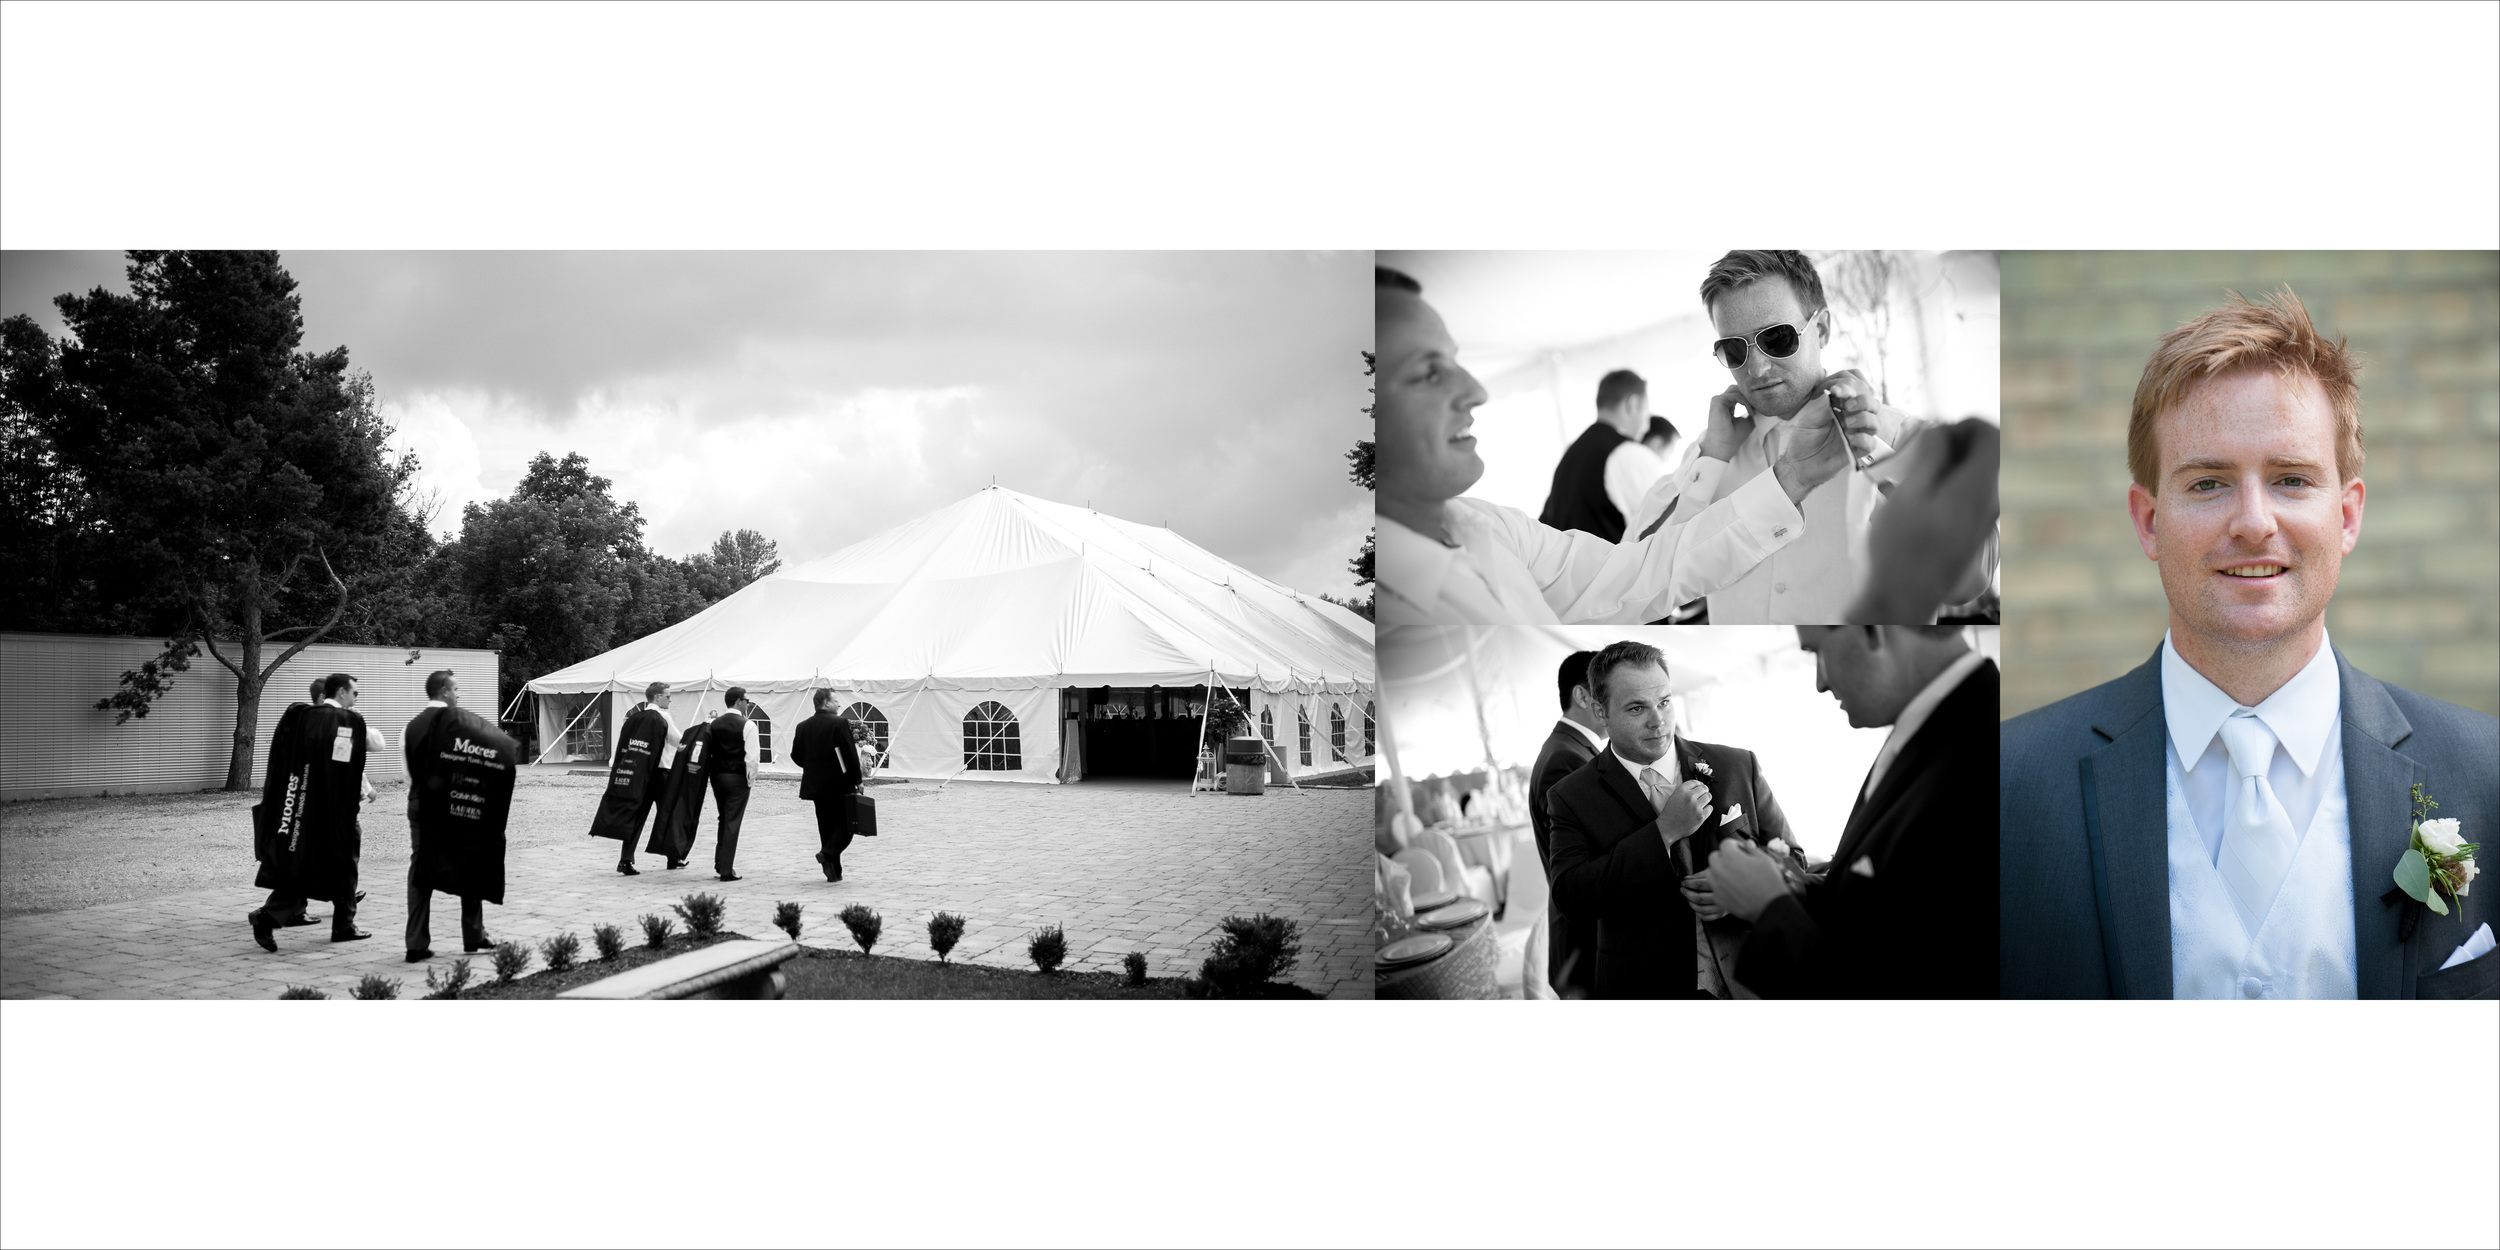 nith-ridge-wedding-album8.jpg